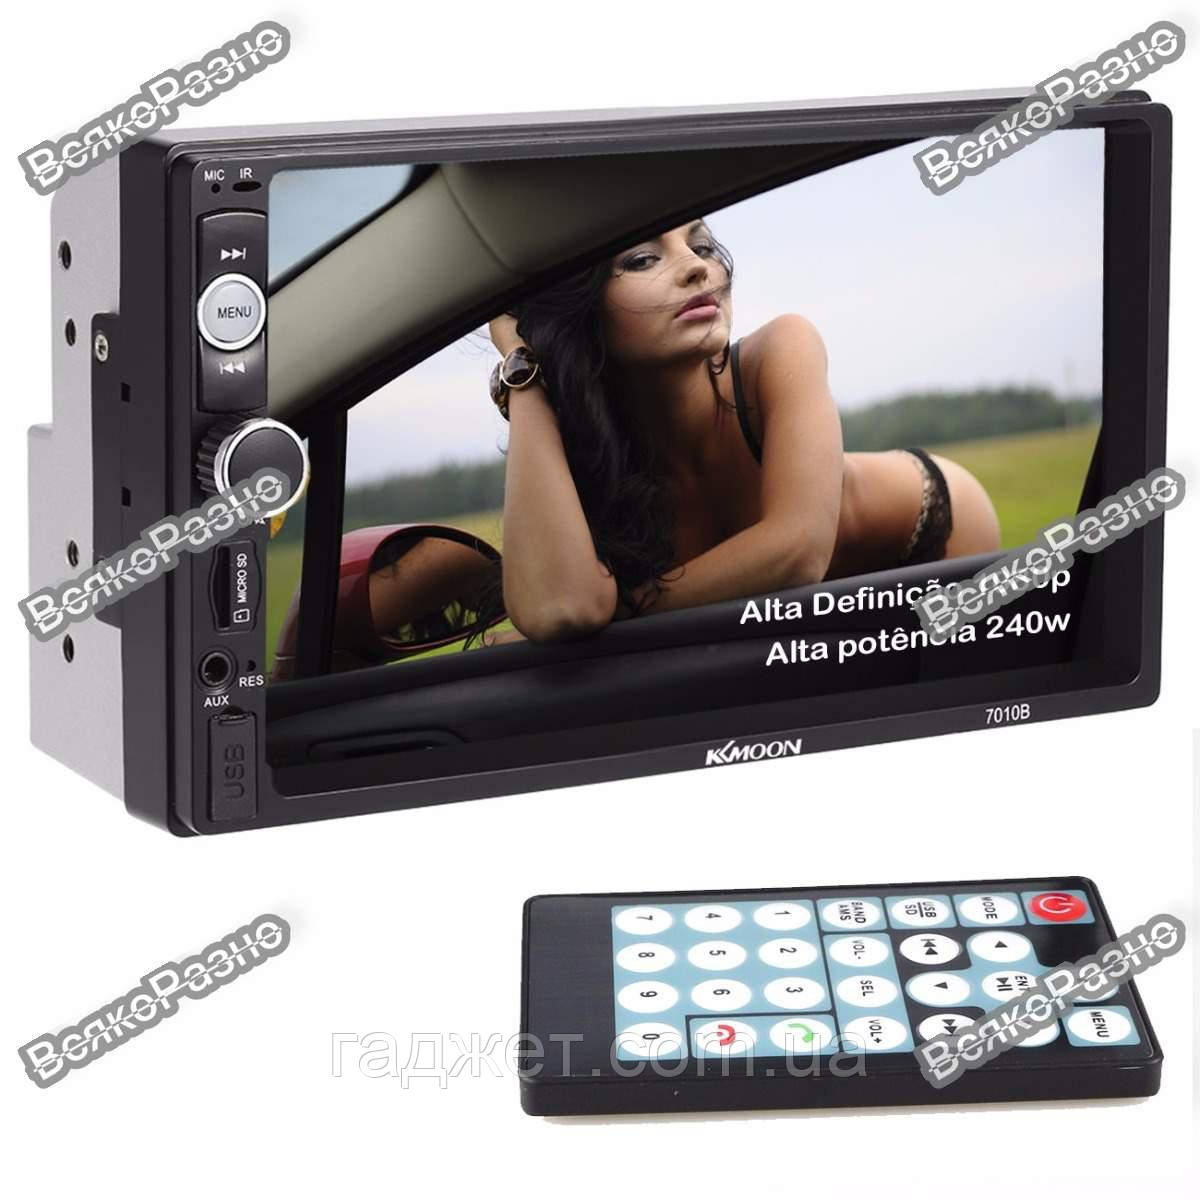 Автомагнитола 2DIN KKMOON (Pioneer) 7010b\7018b. USB+SD+Bluetoth+Видео вход.